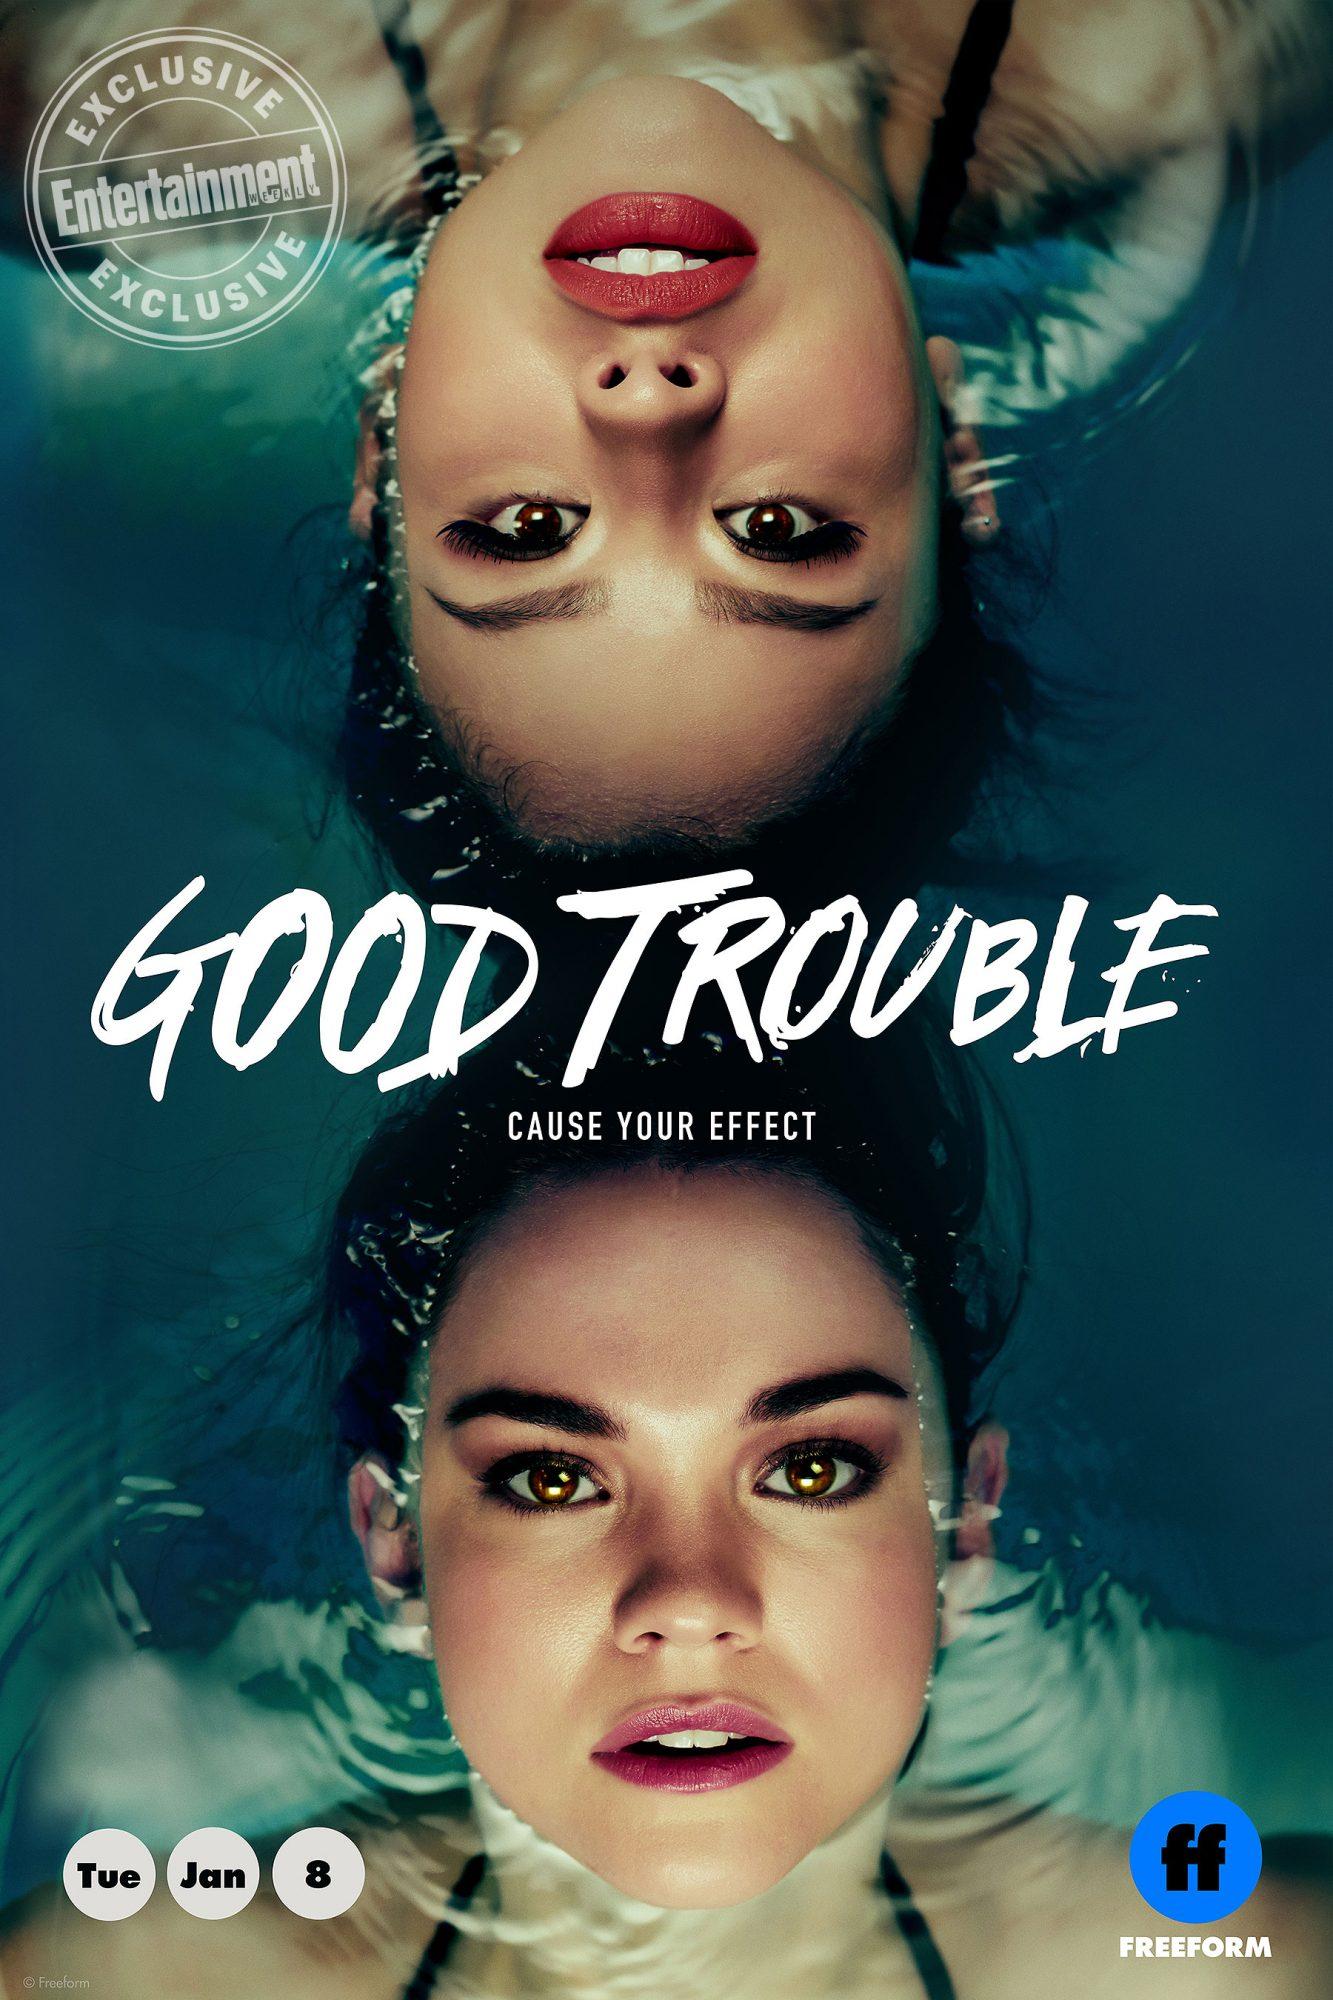 Good TroubleCredit: Freeform